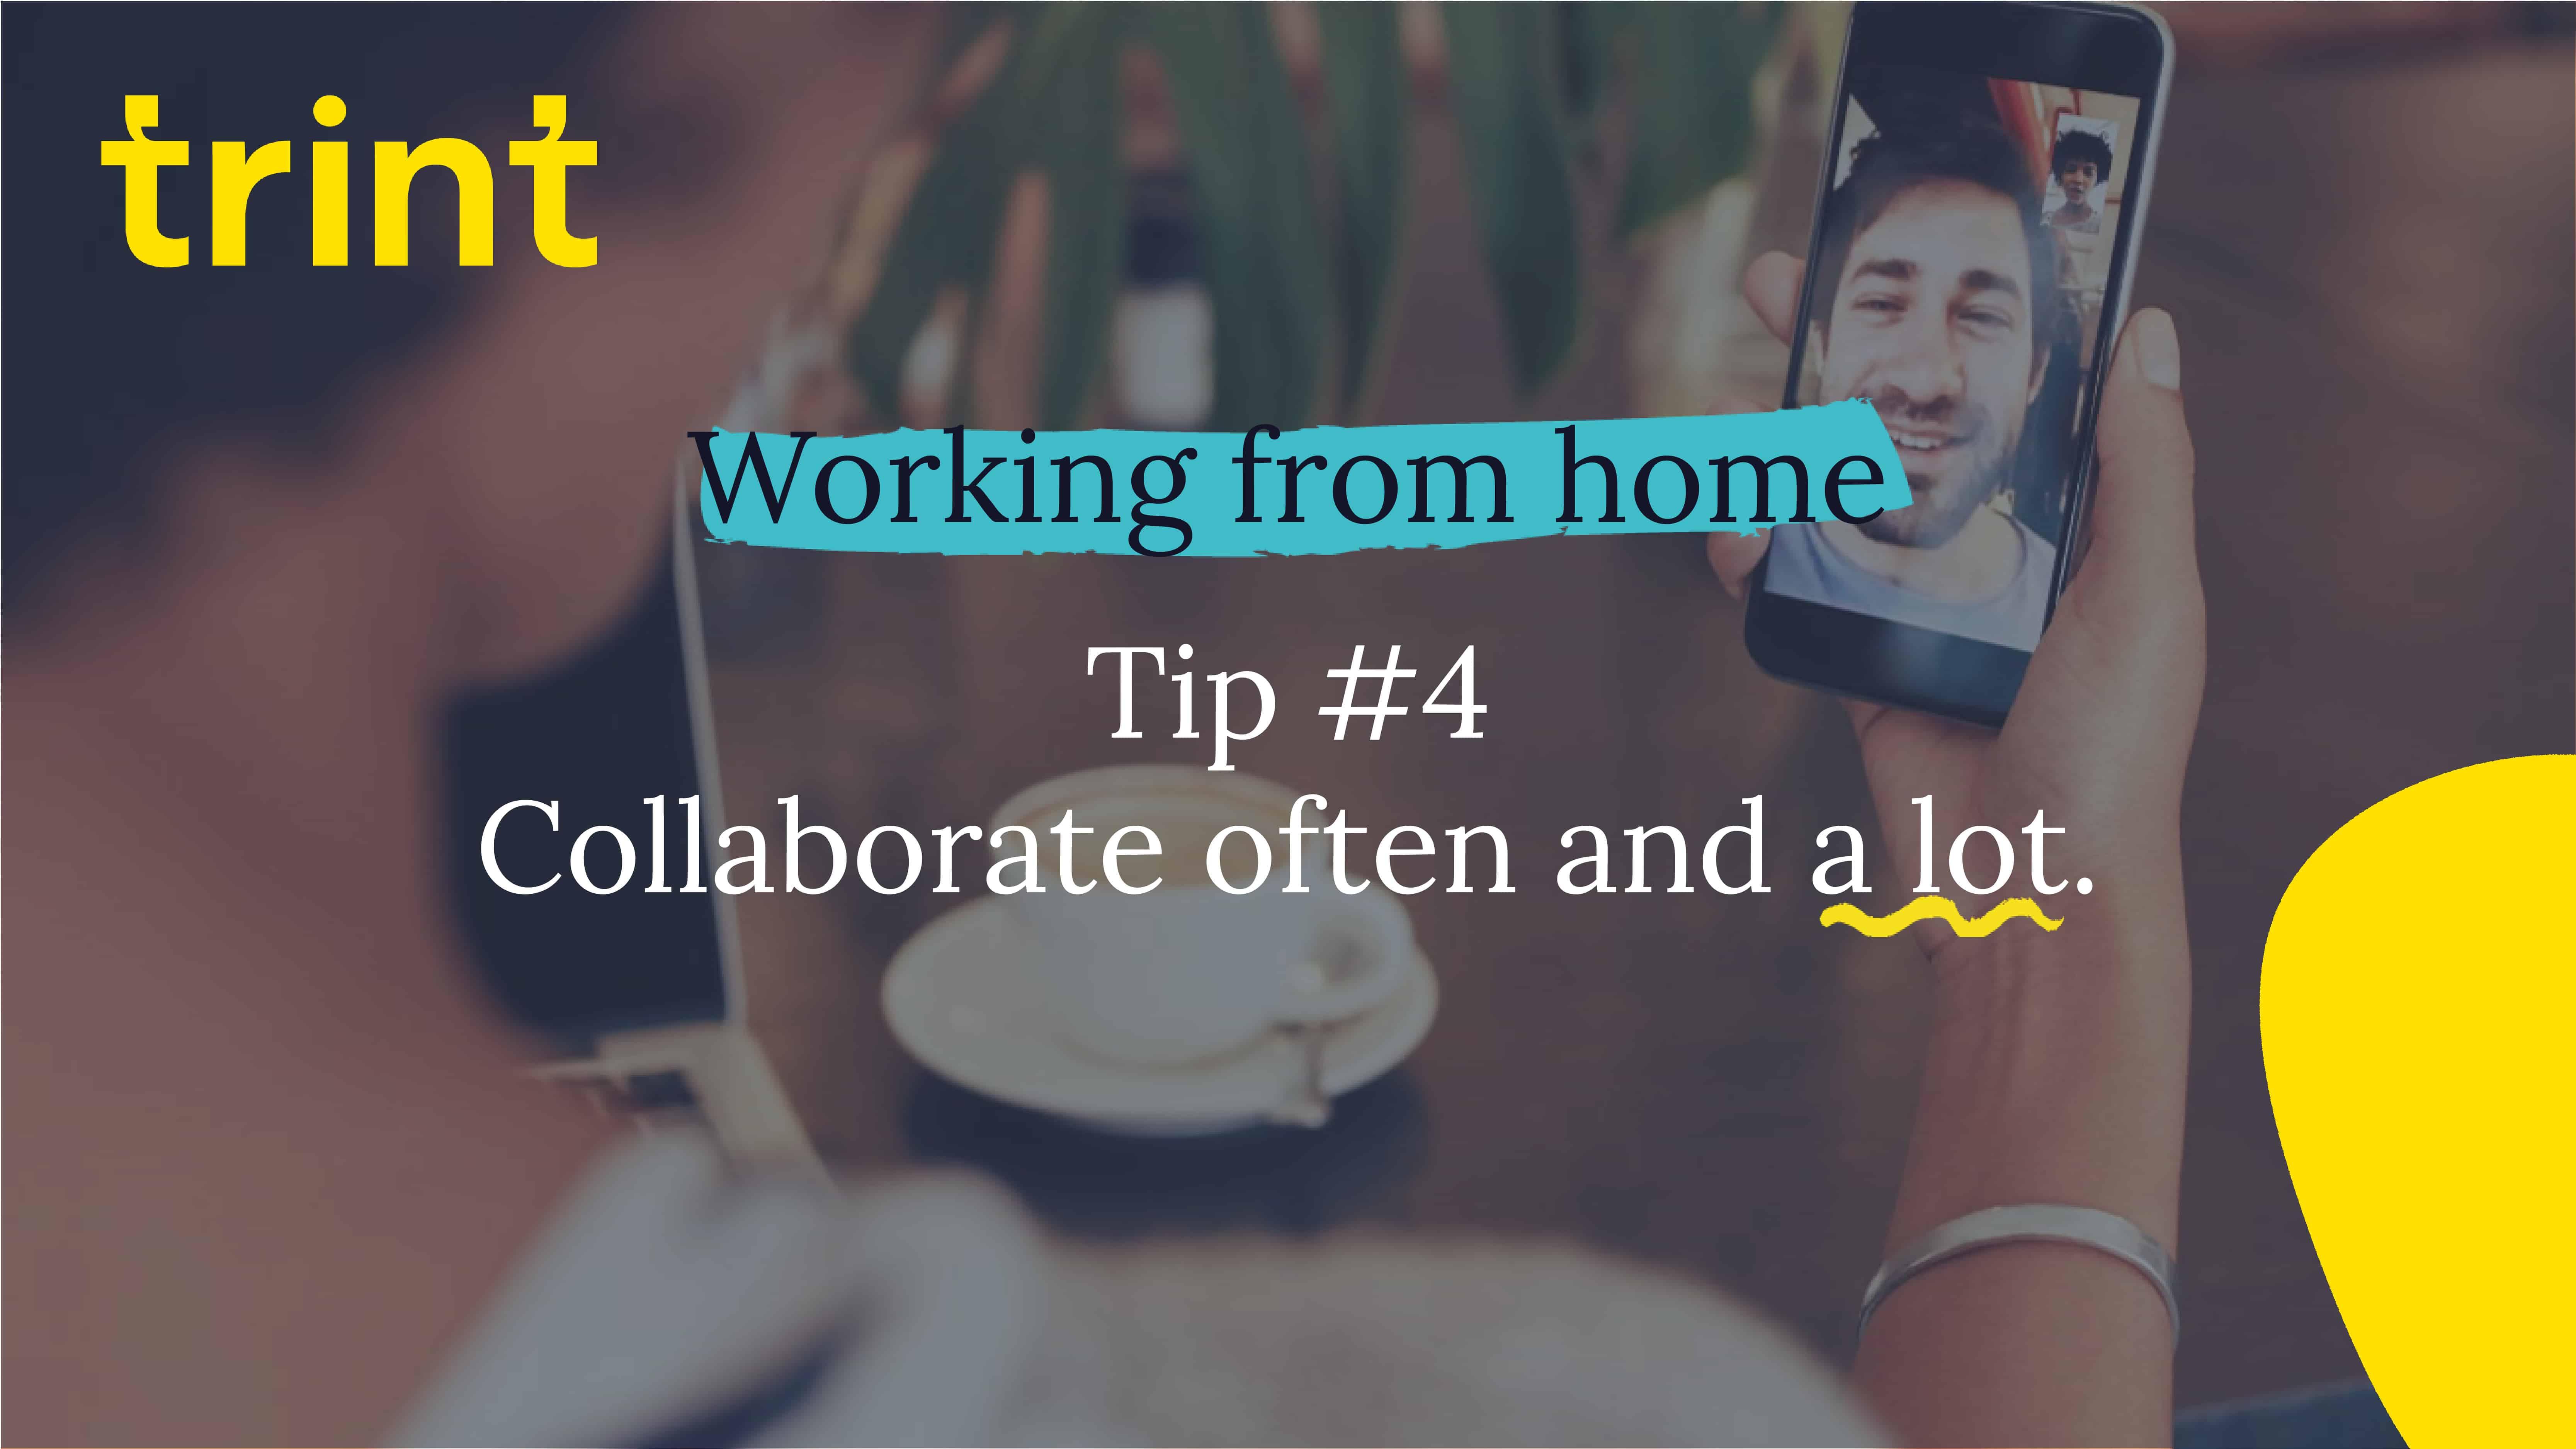 Trint Remote Working Tip 4